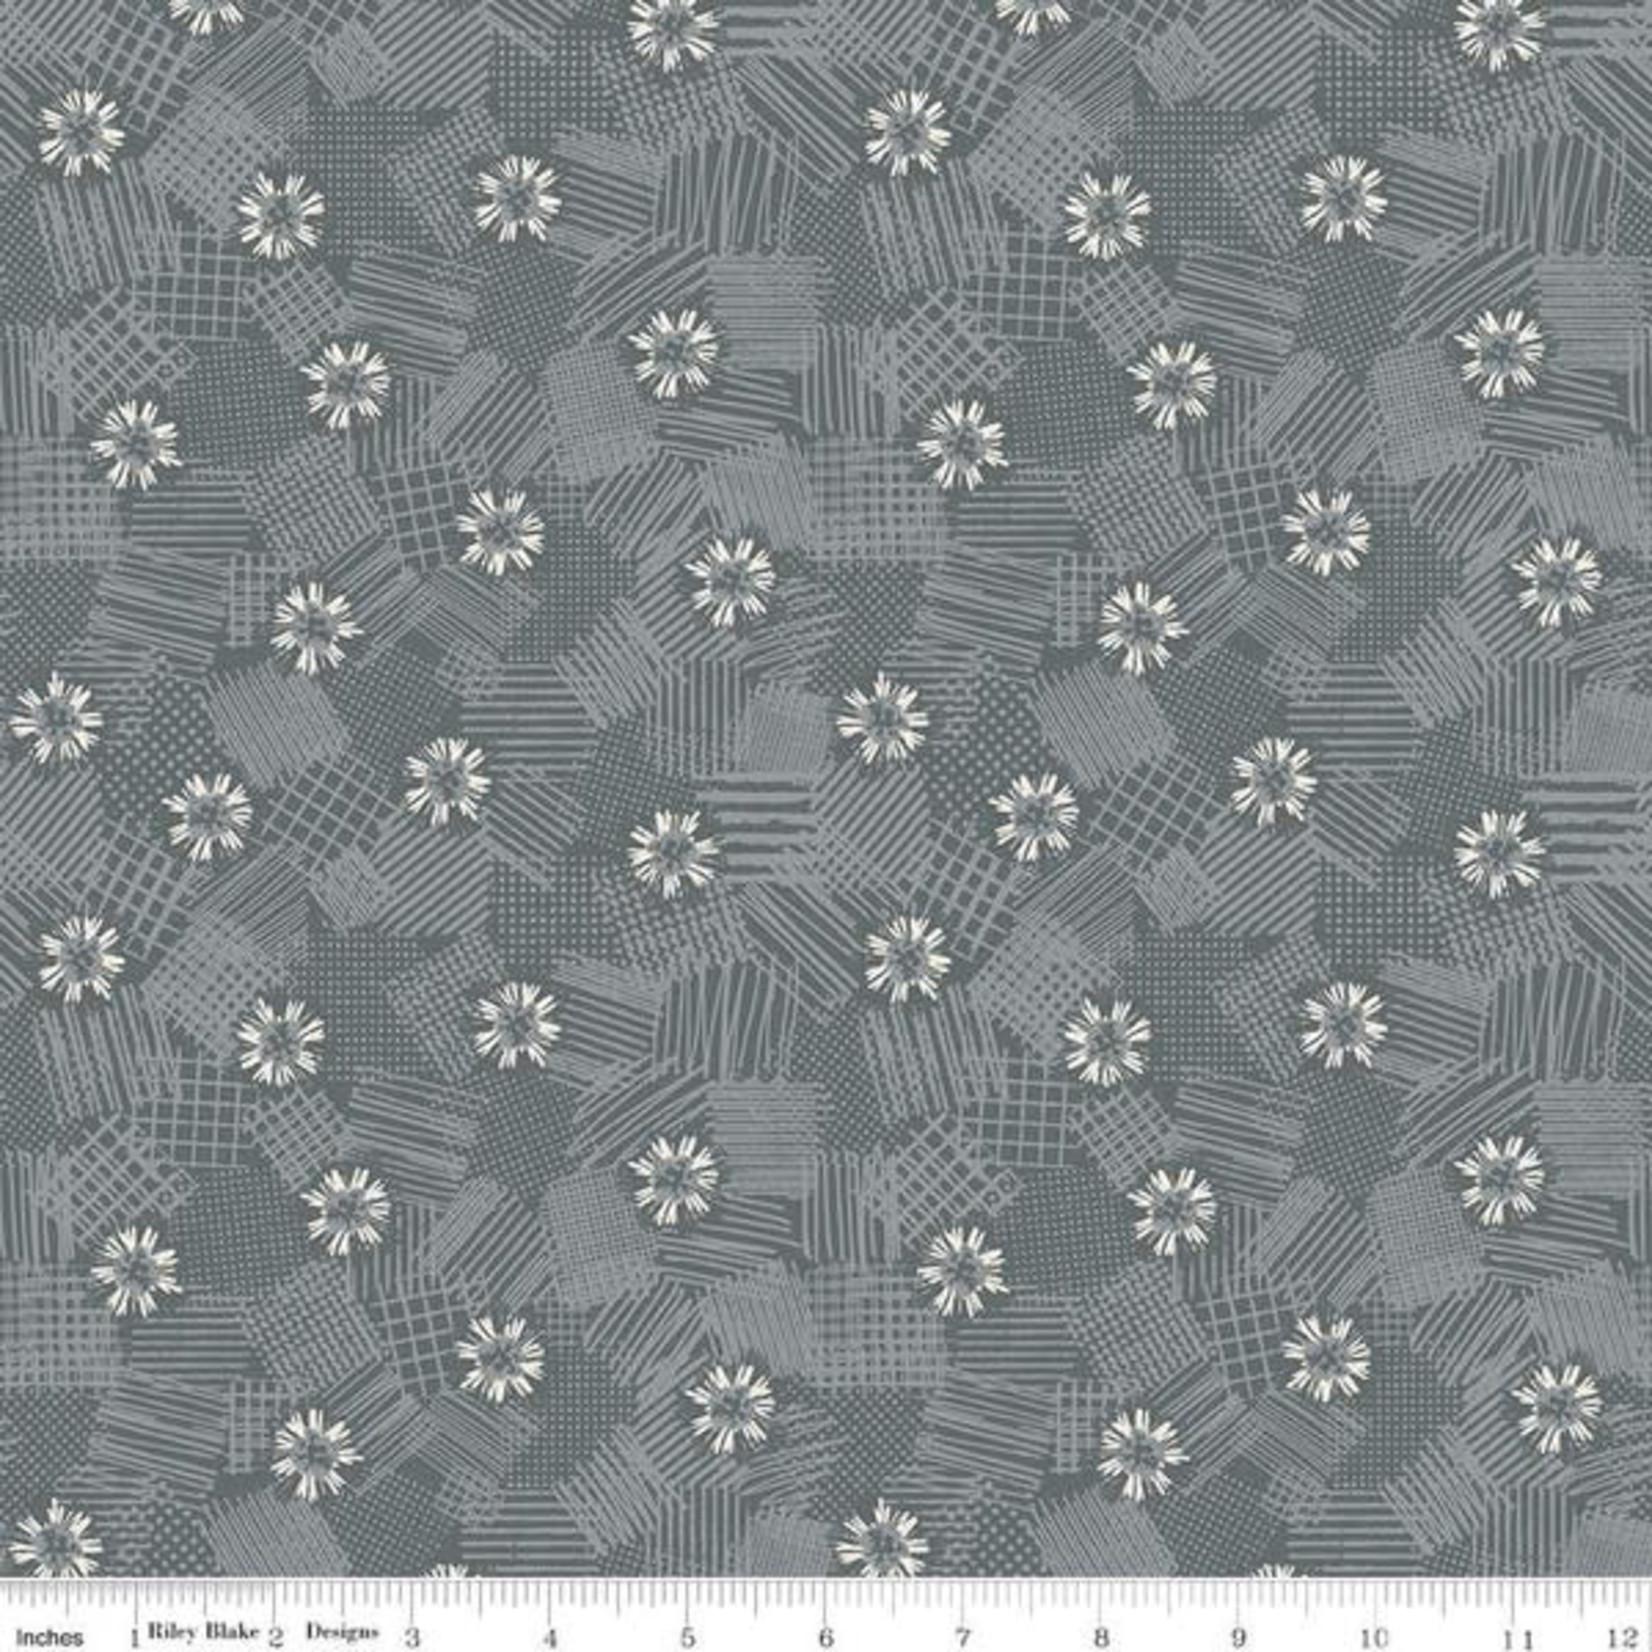 Riley Blake Designs MEADOW LANE, SCRIBBLED FLORAL, GRAY C10123 PER CM OR $20/M